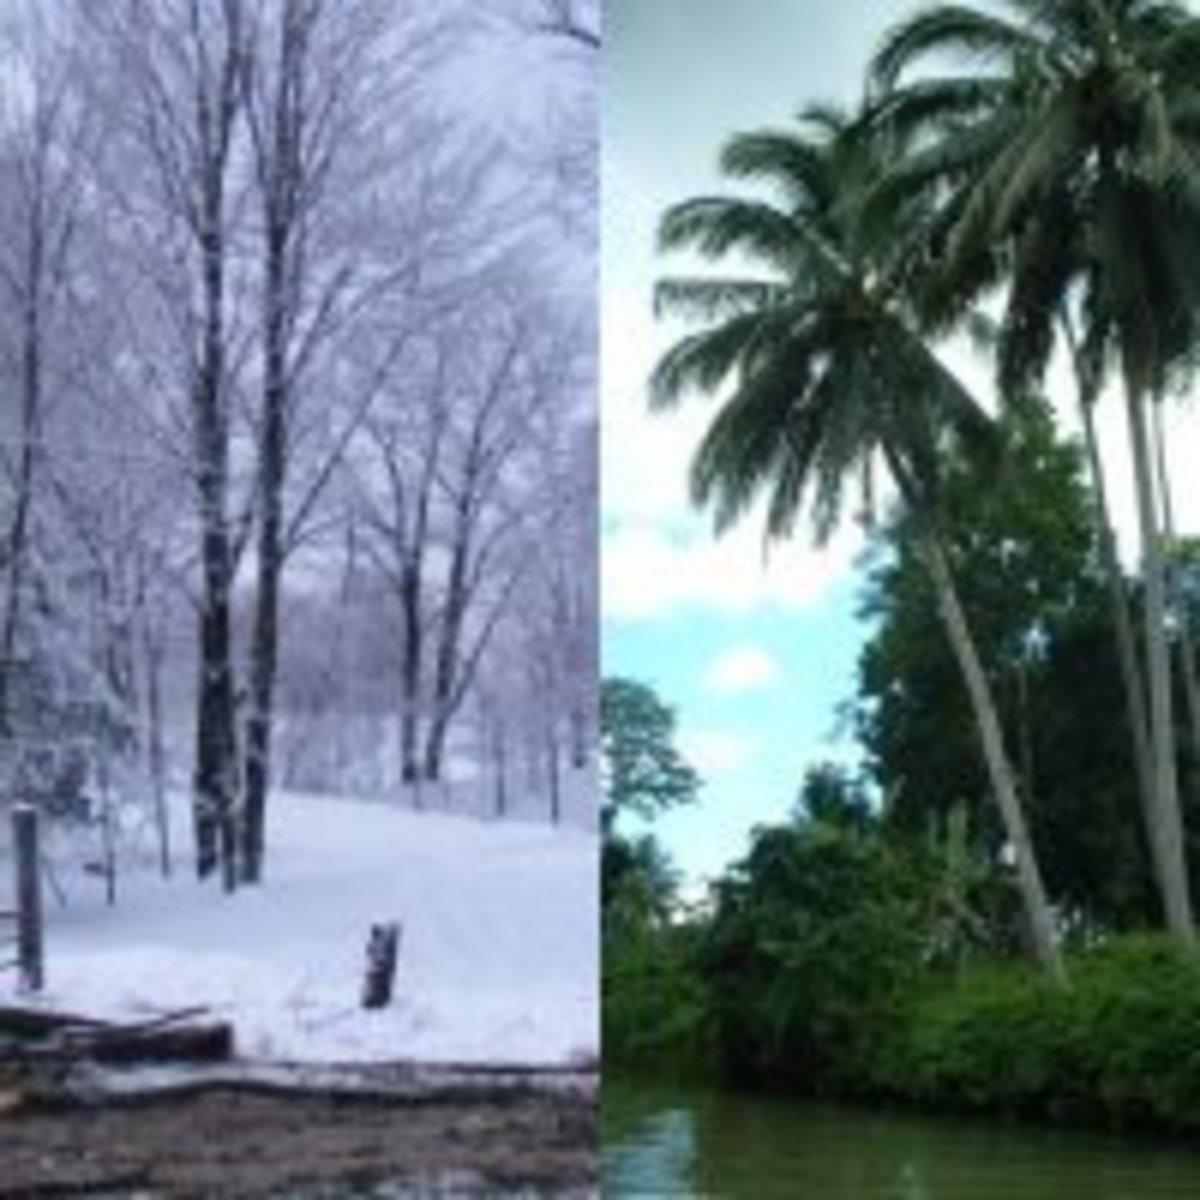 Climate change 9620 BC. Tropics copyright Rod Martin, Jr. Snow courtesy Morguefile.com (public domain).